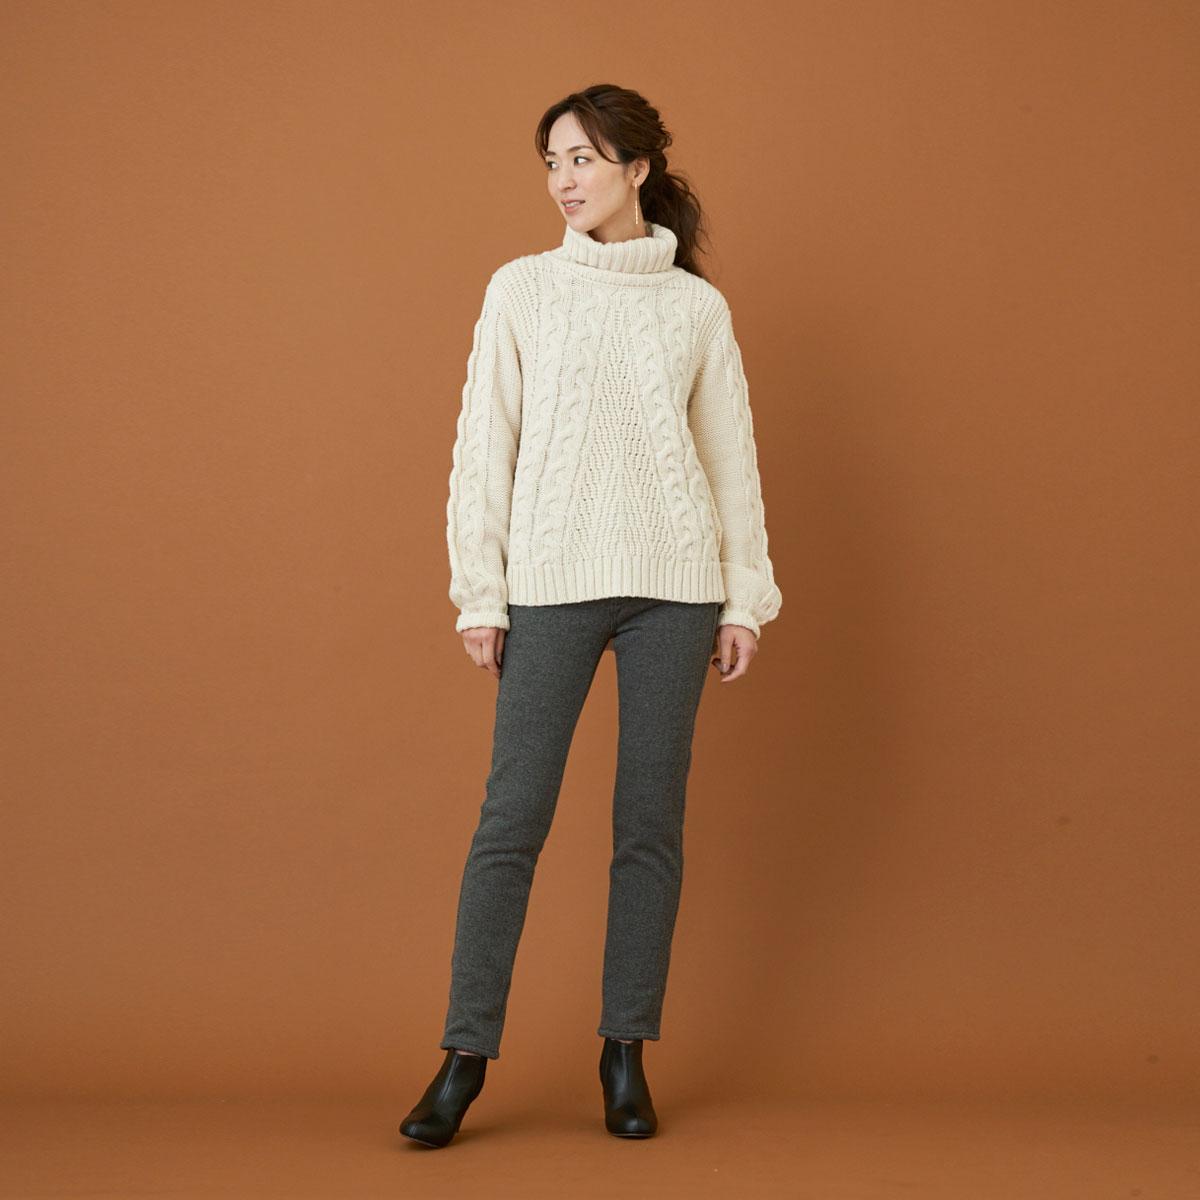 【SALE】Mrs.Jeana GOLD ■暖■ 裏ボアシャギータイトスキニー GM3812